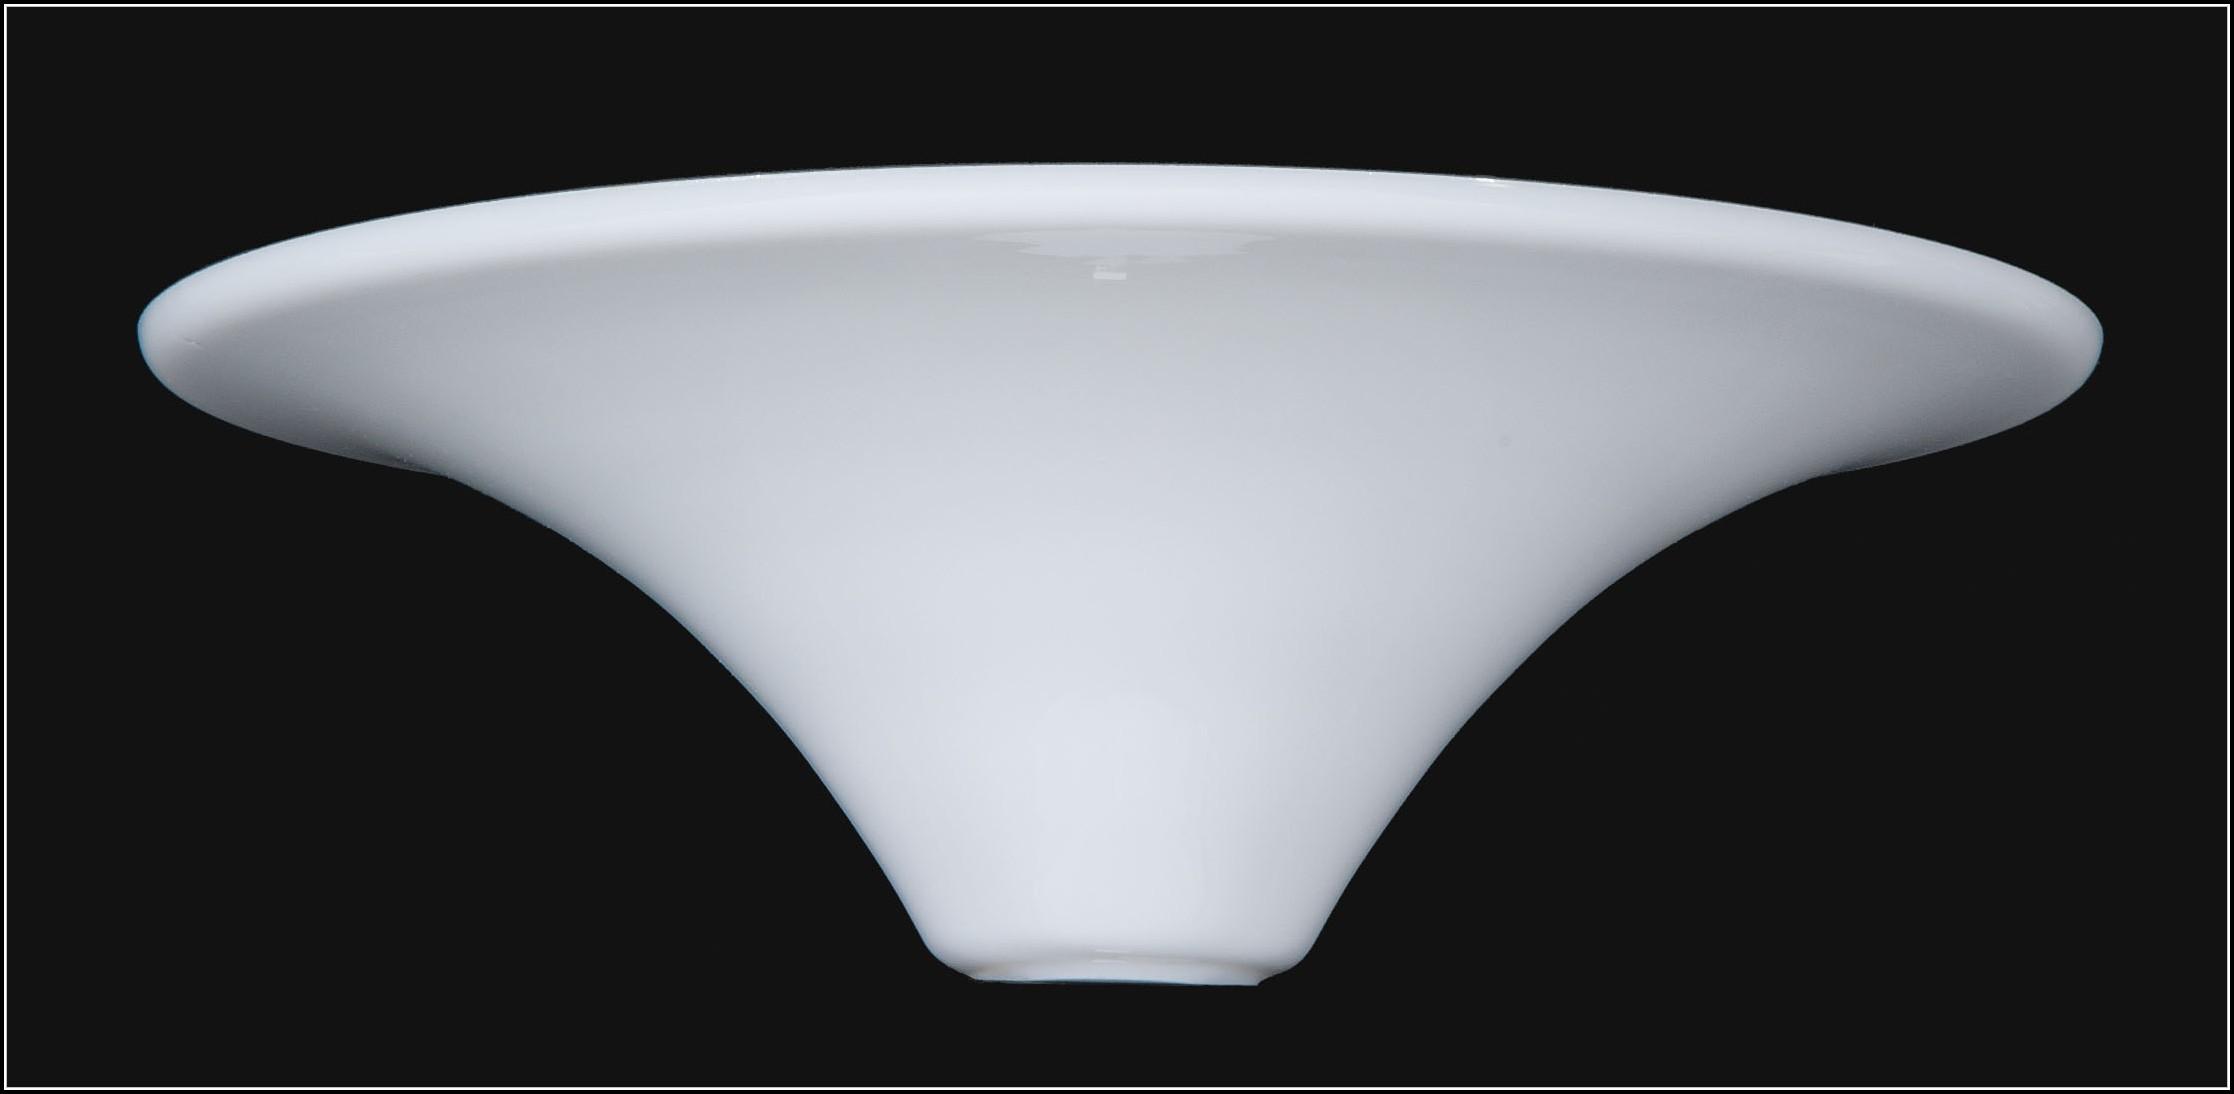 Floor Lamp Replacement Shade Plastic